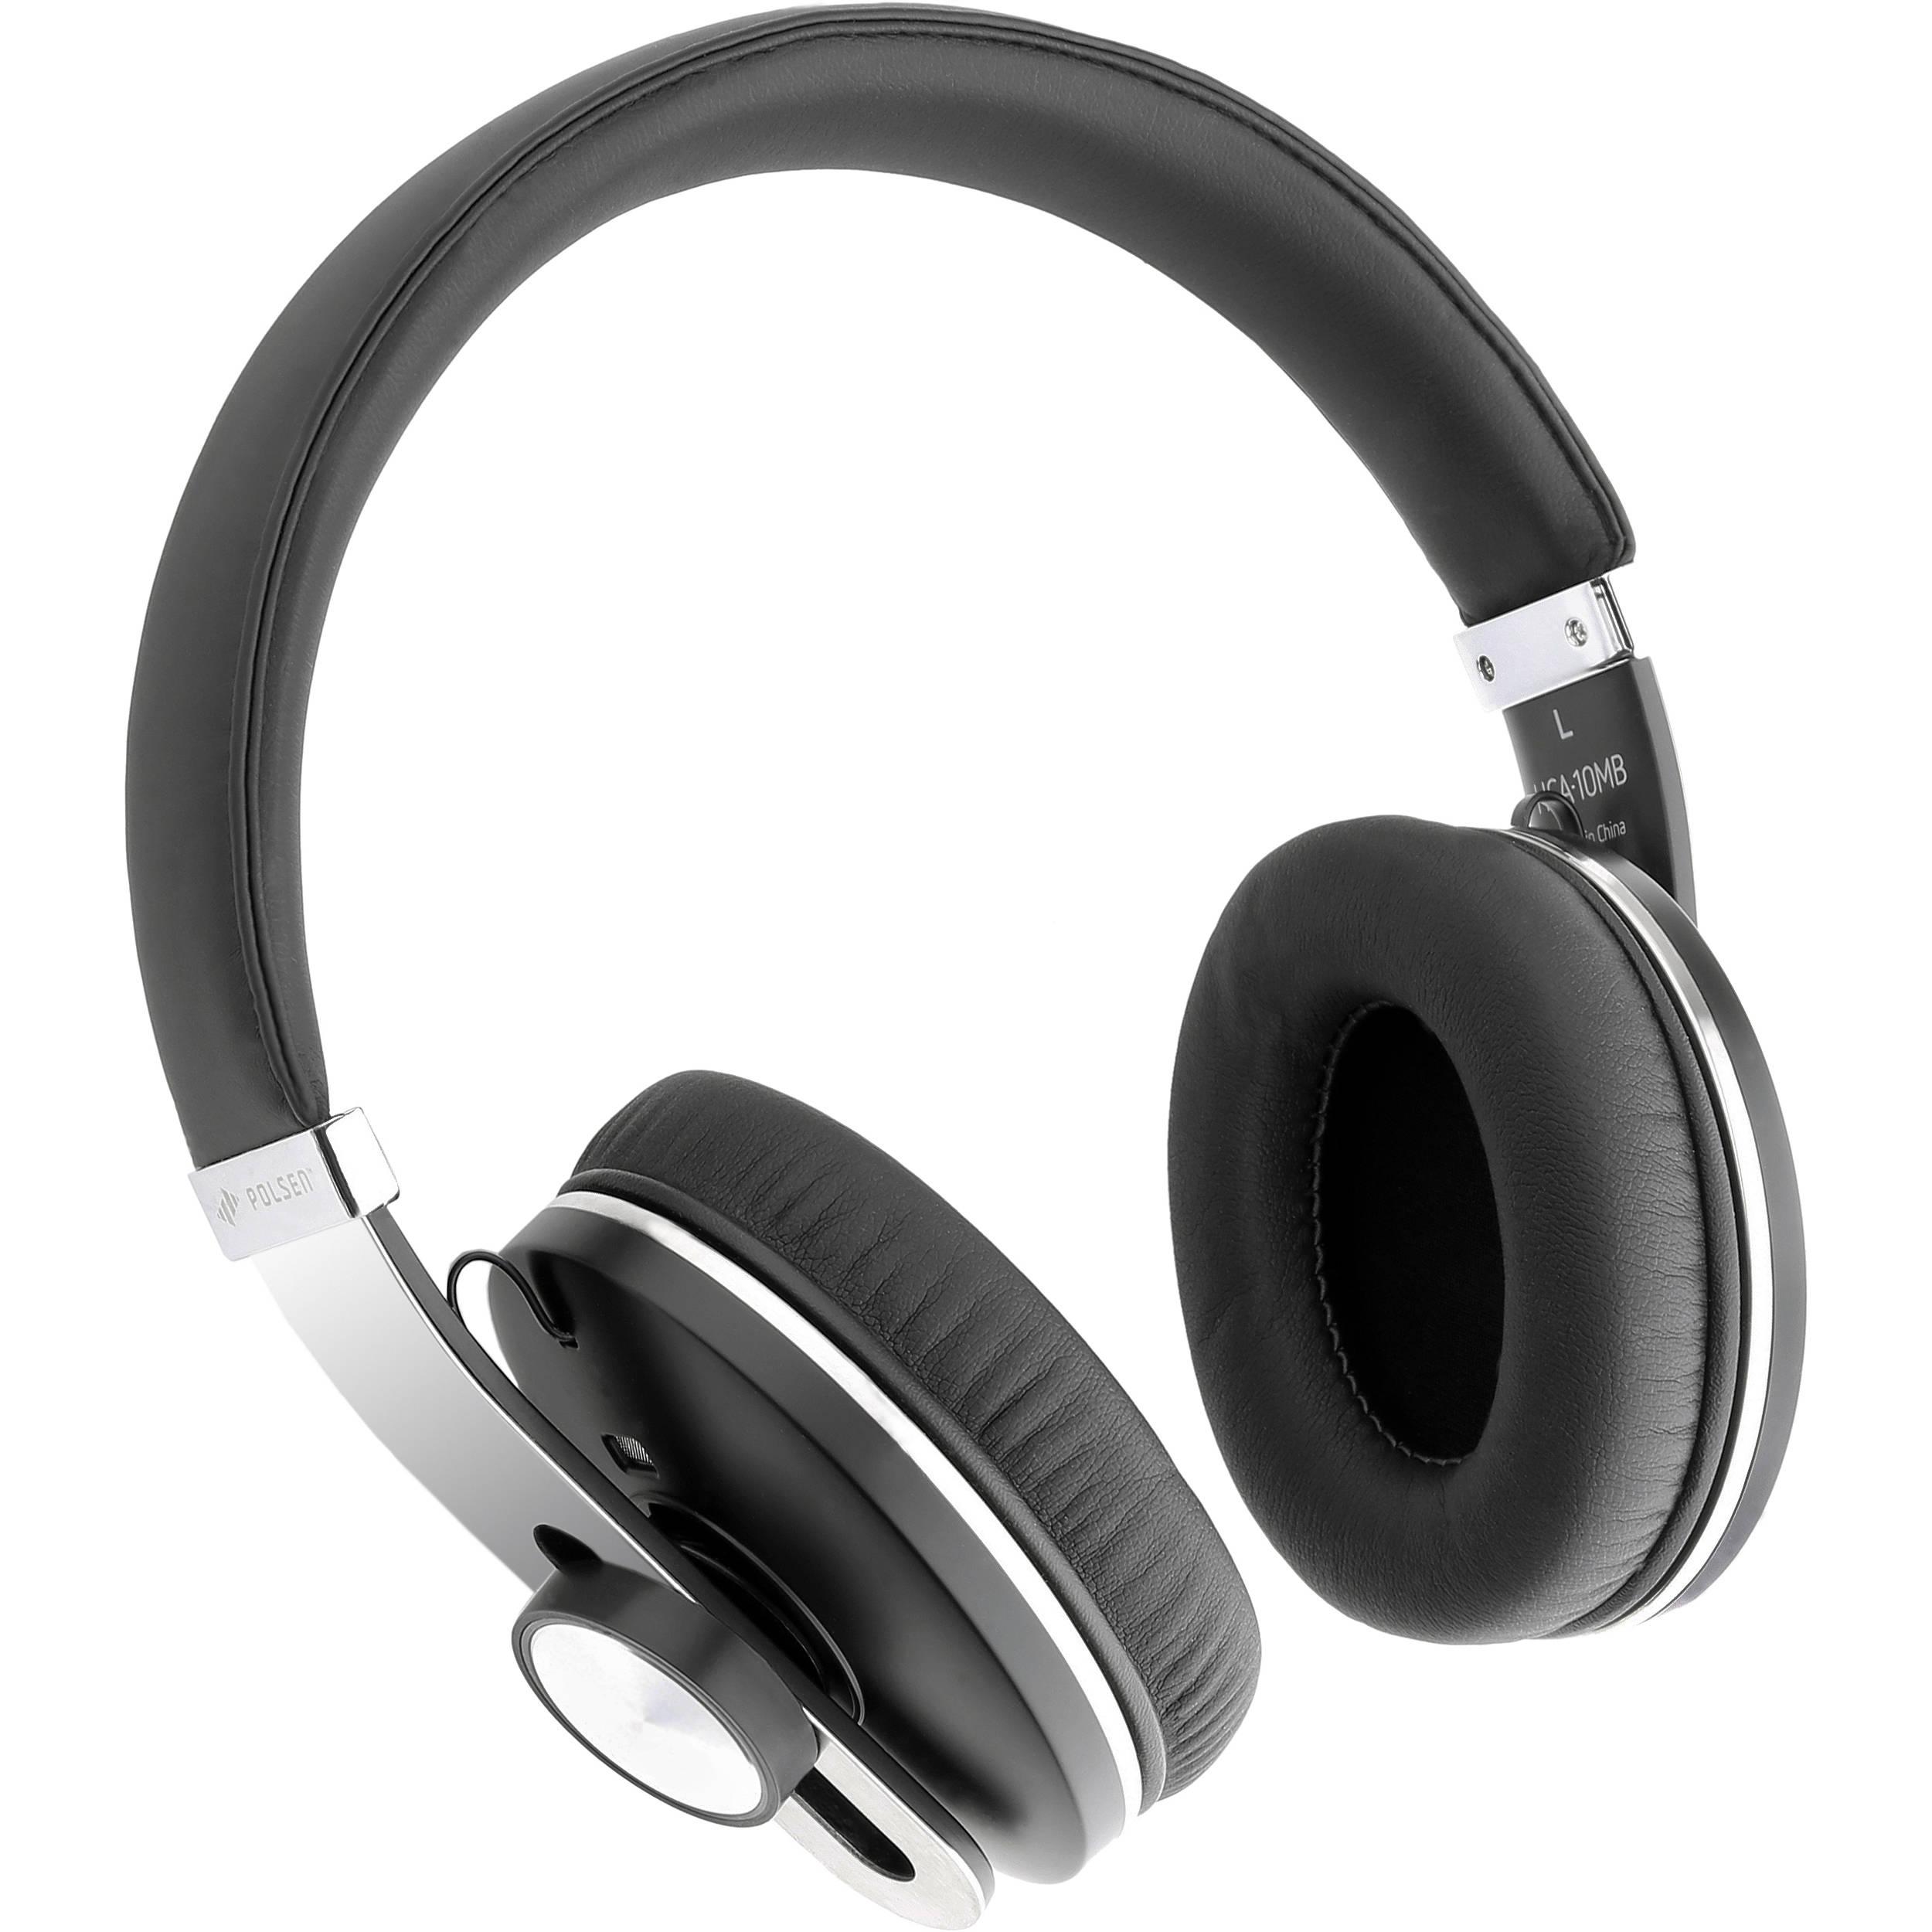 Polsen Hca 10mb Wireless Headphone Around Ear Bluetooth Headset Hca 10mb B H